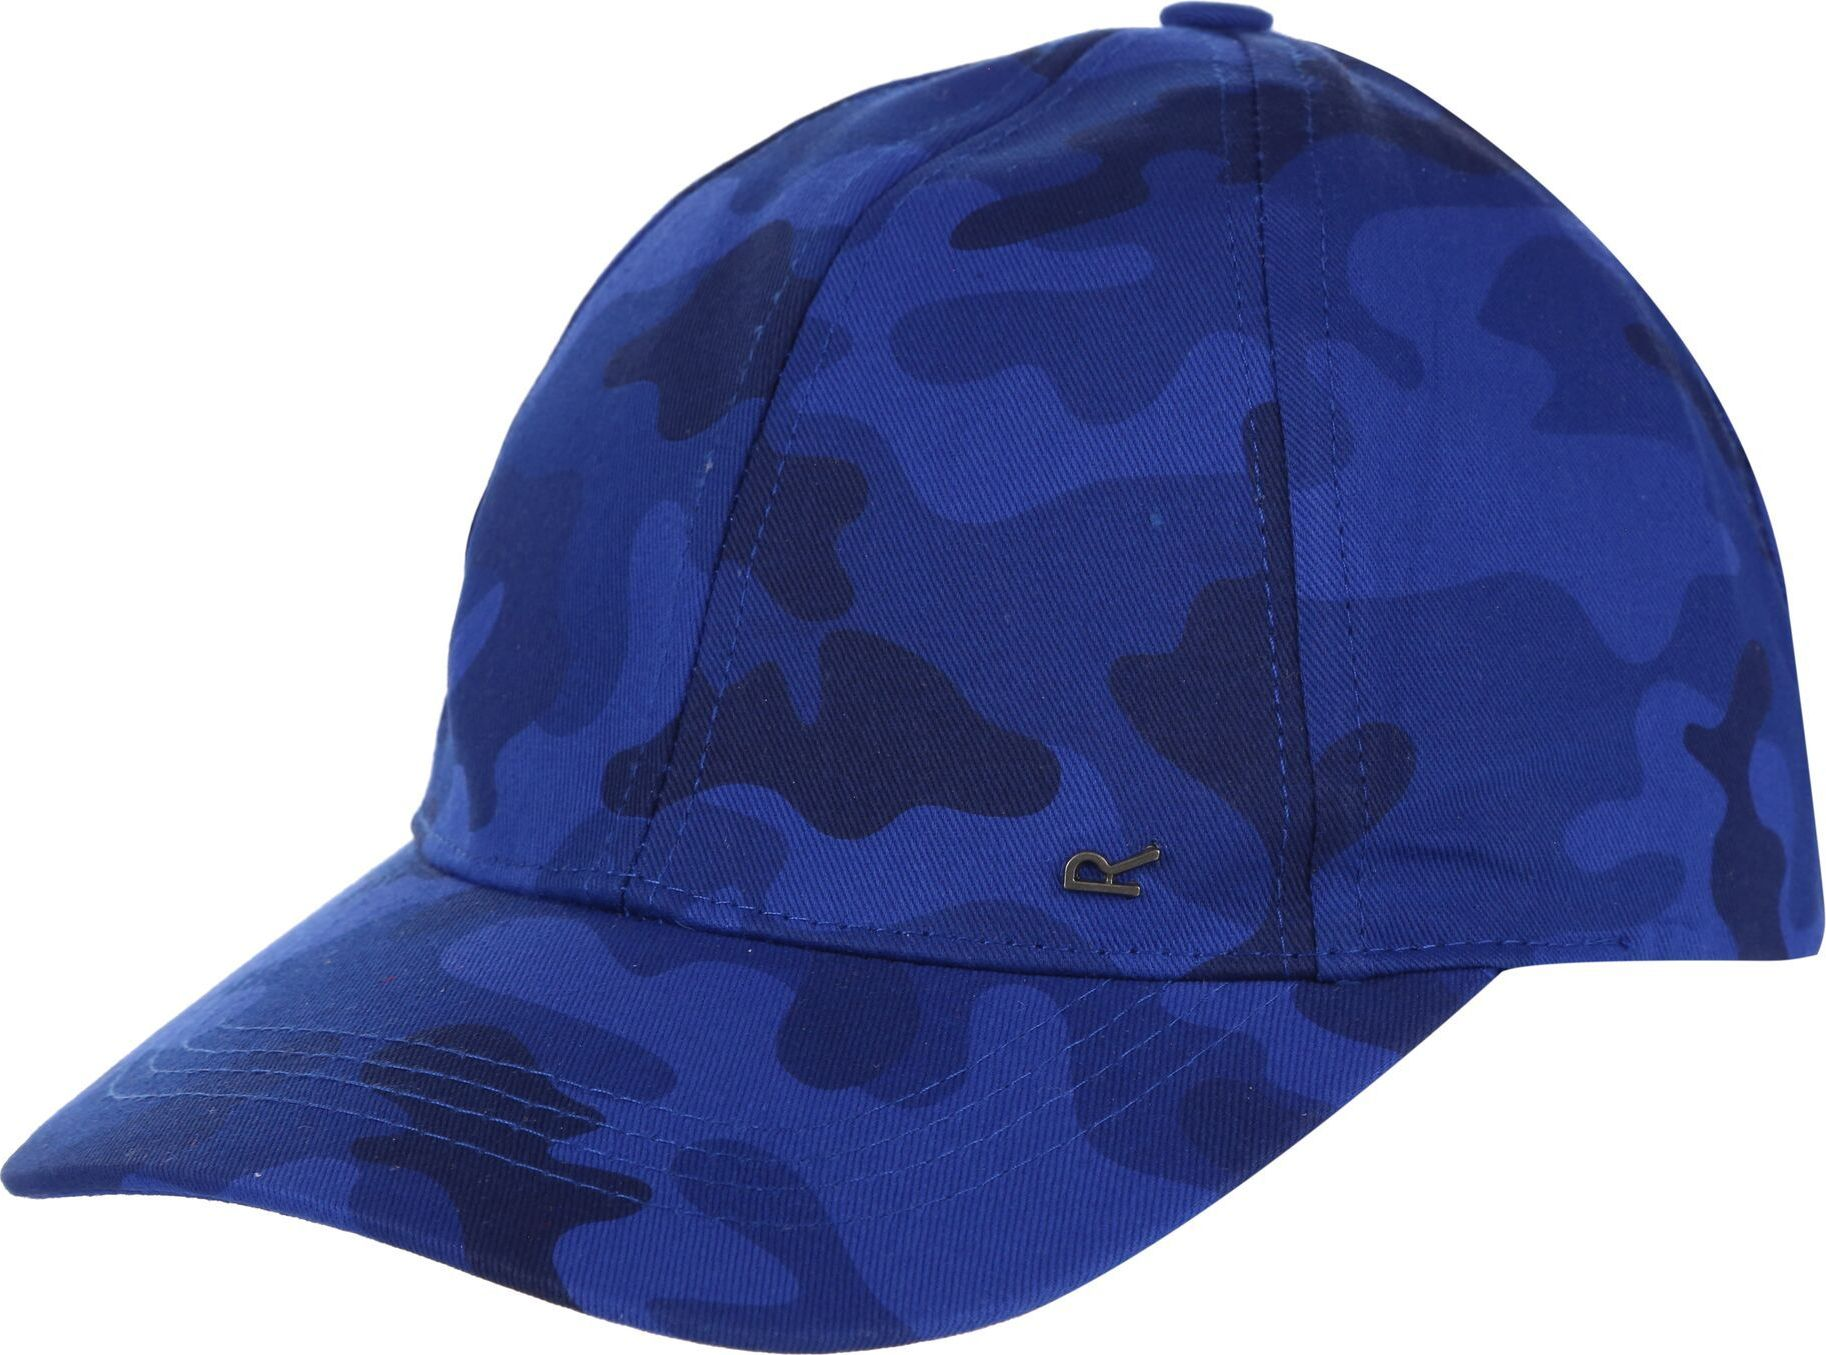 Dětská kšiltovka Regatta Cuyler Cap III 48U modrá 7-10